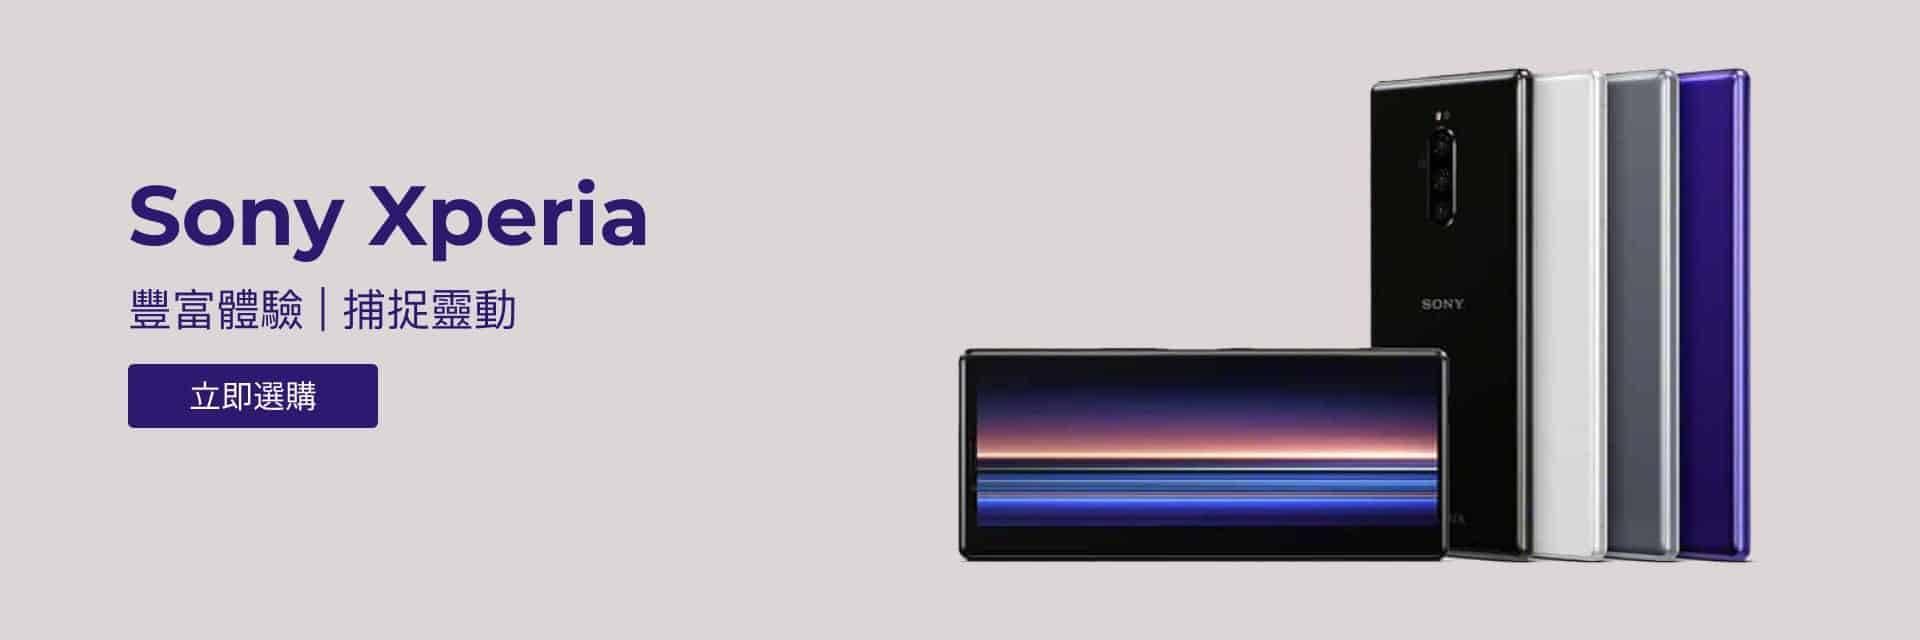 Ola Tech 索尼 Xperia 手機 豐富體驗 捕捉靈動